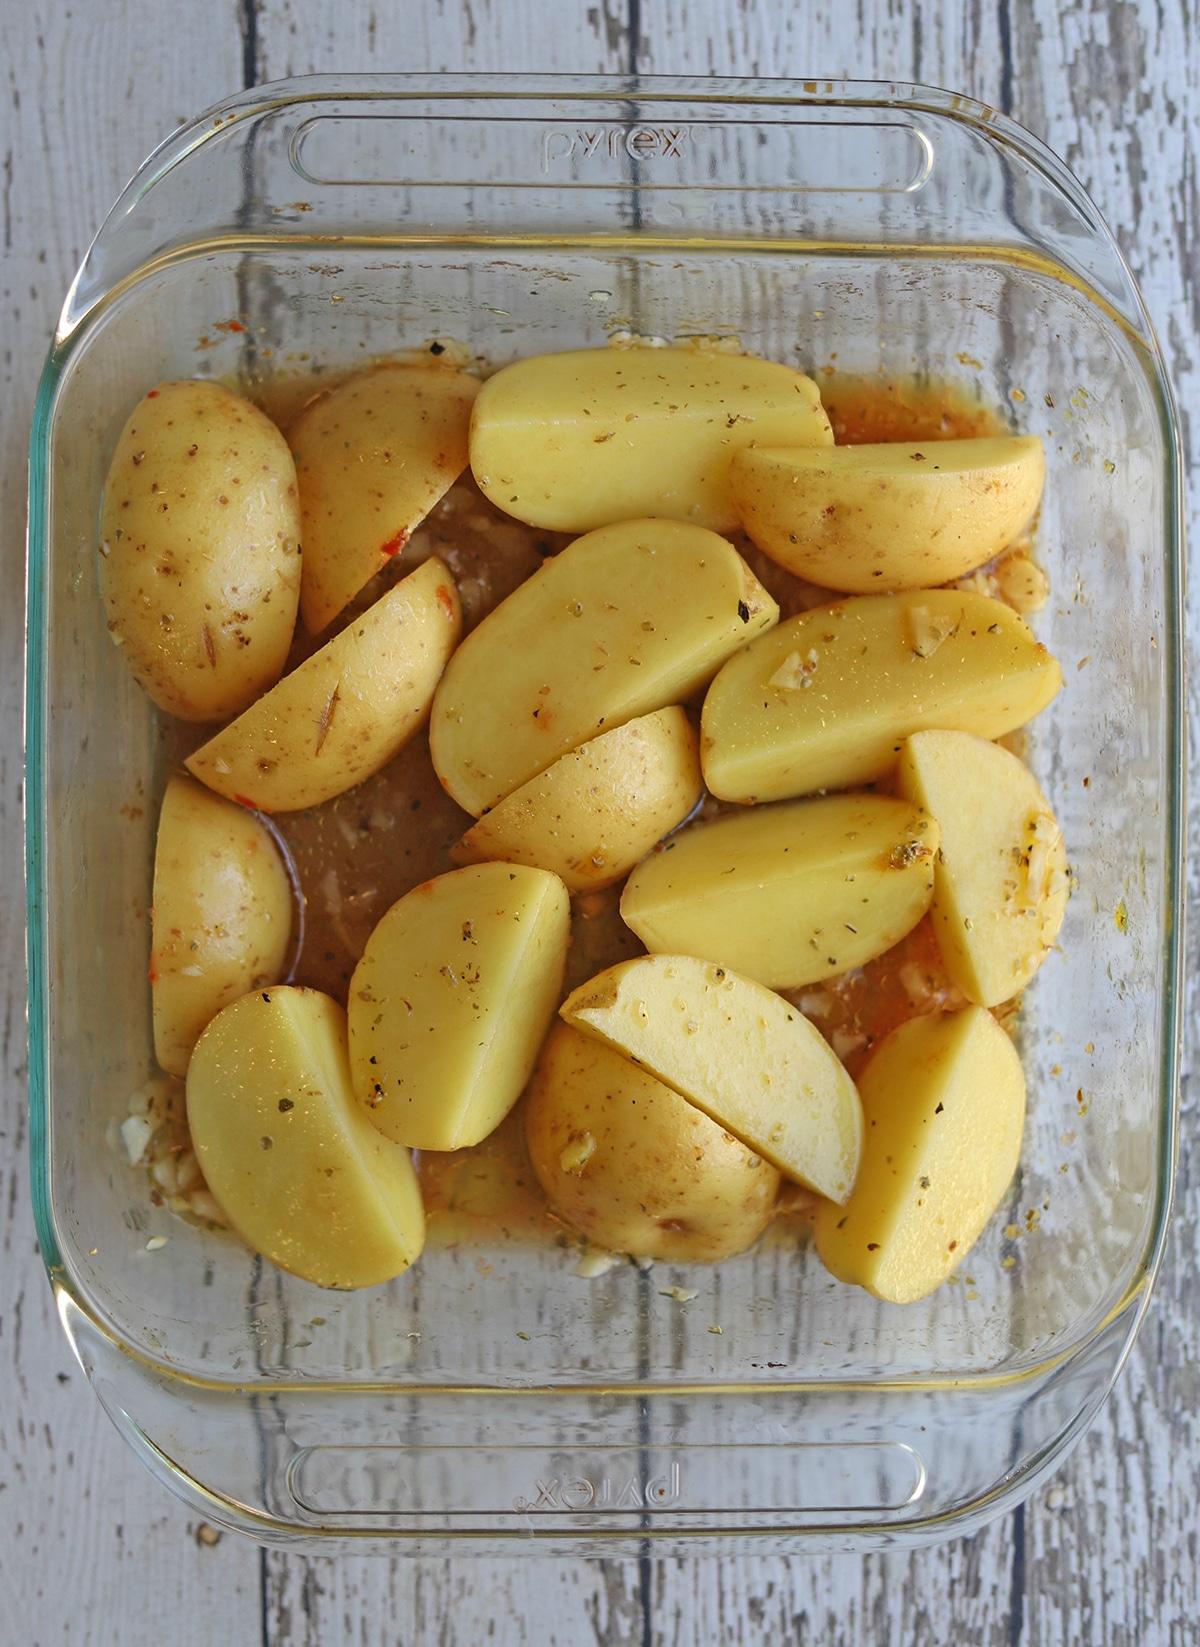 Potatoes in baking dish with seasoned broth.